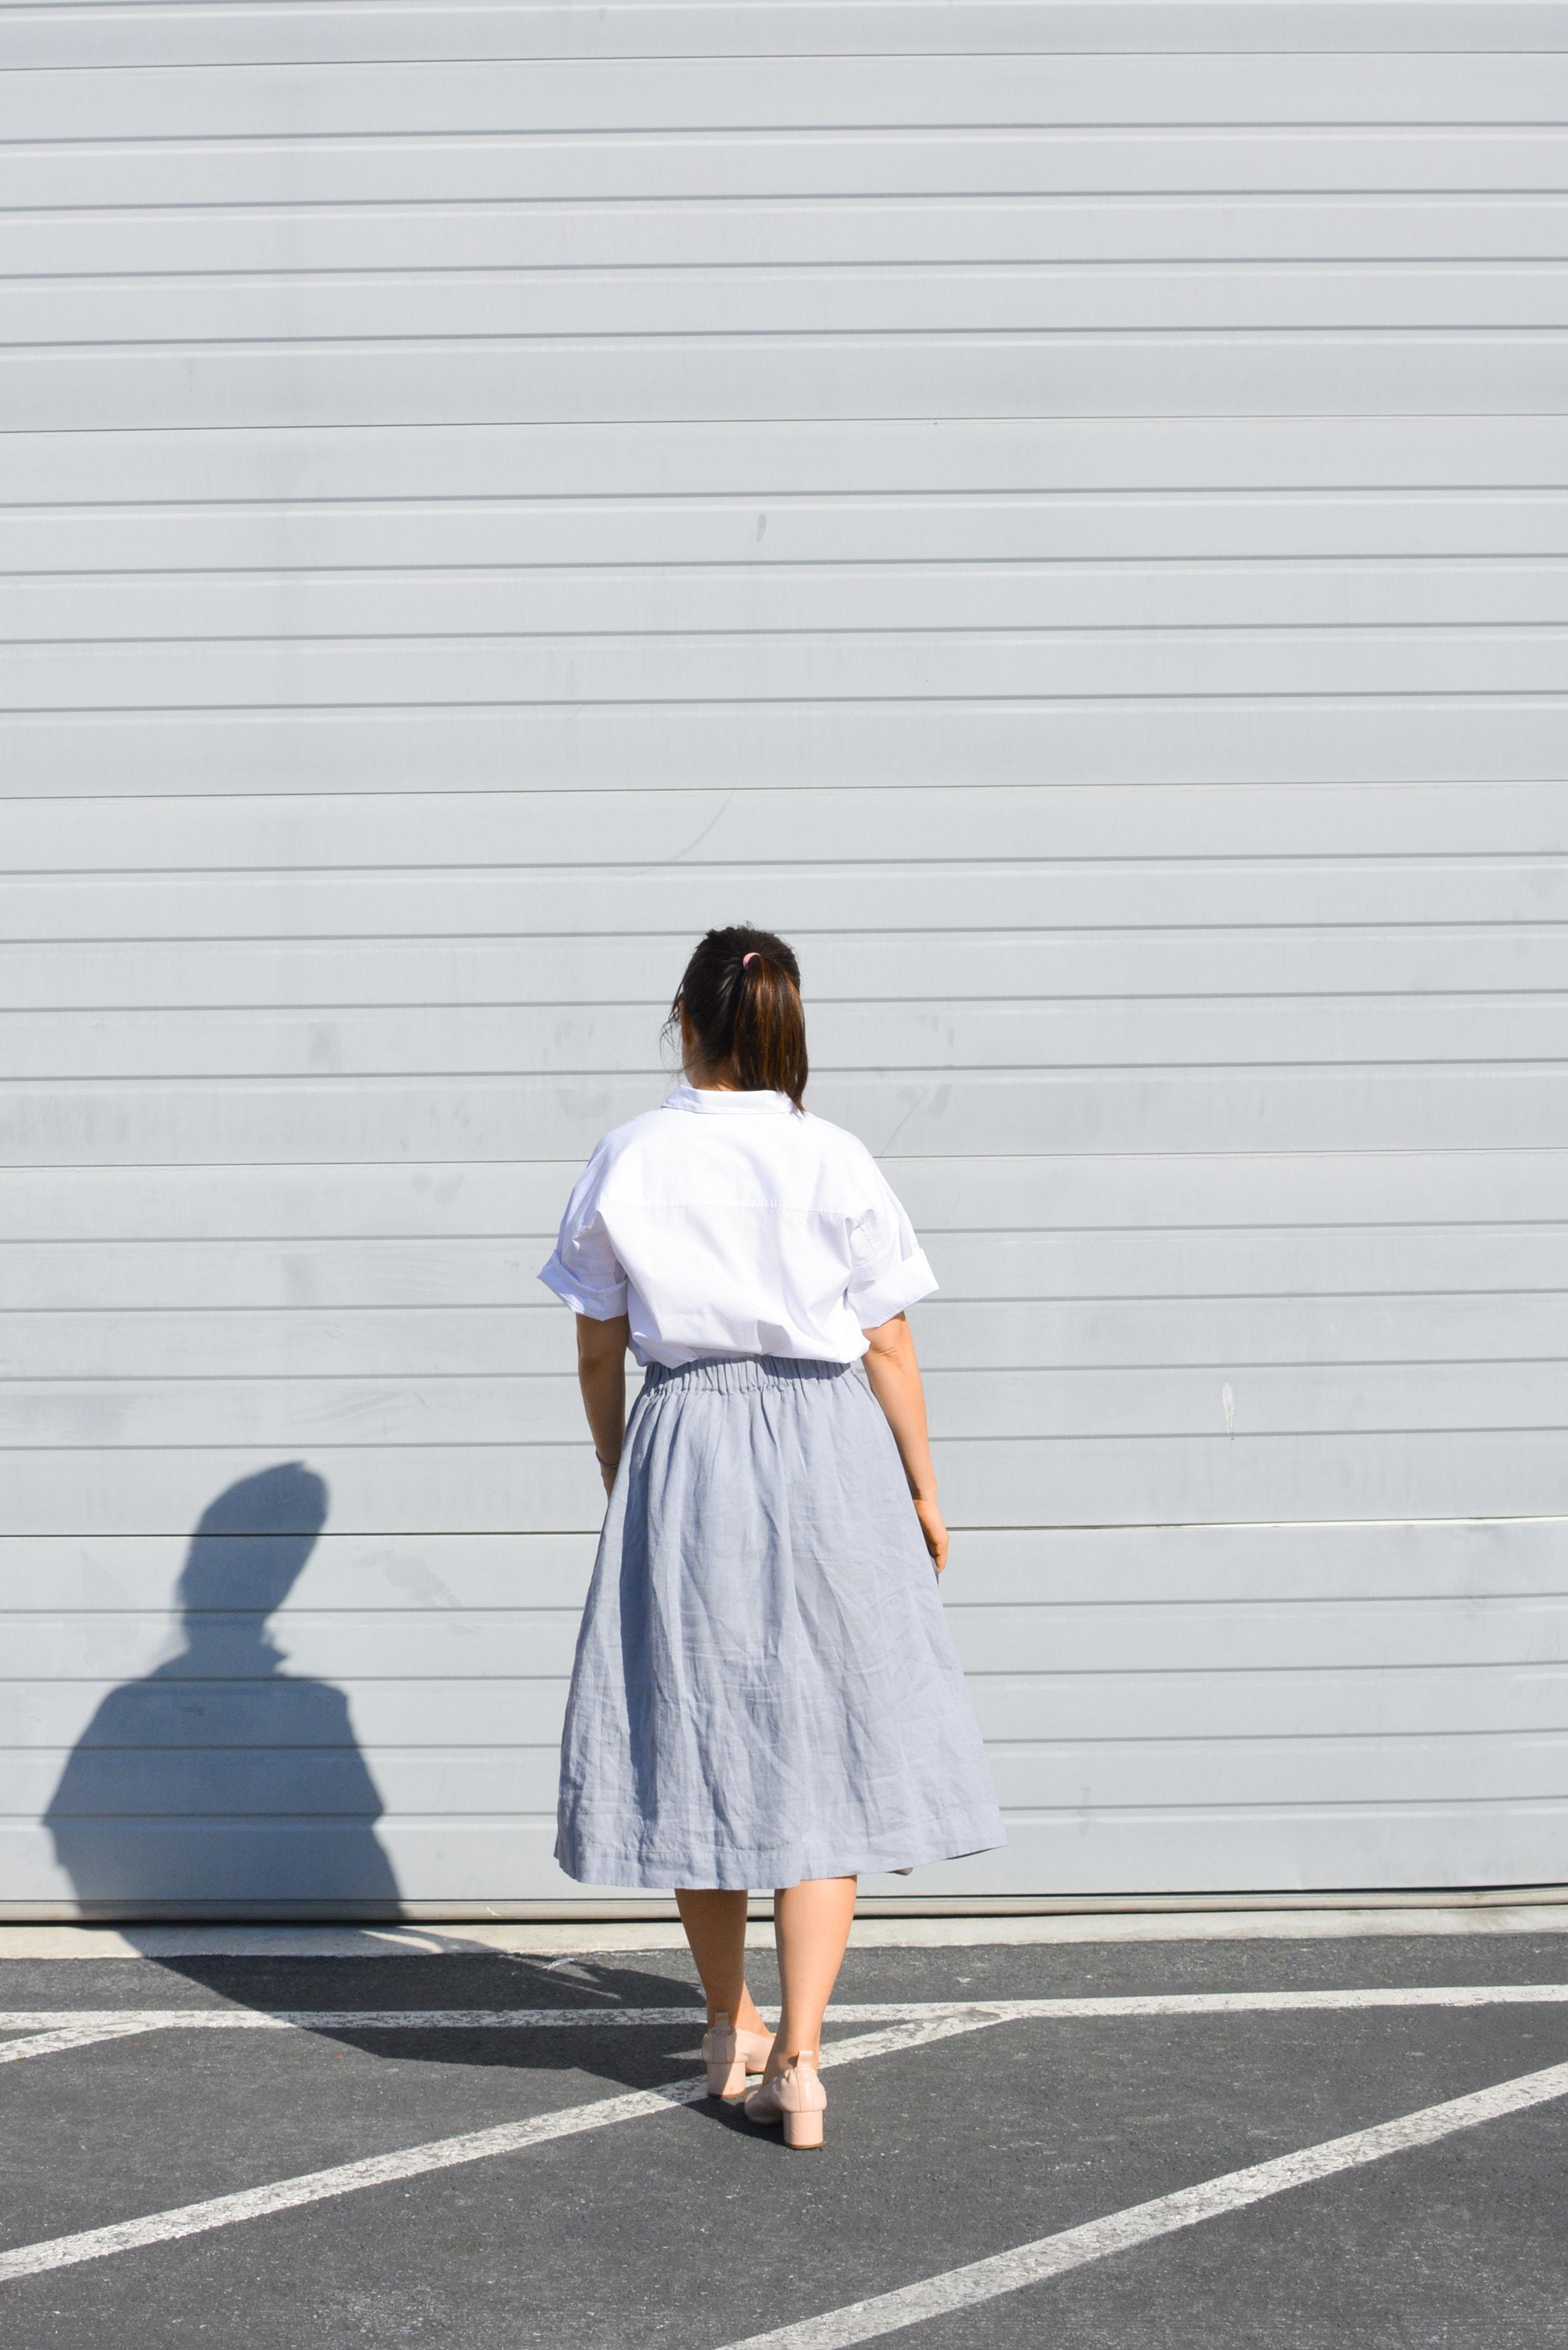 NotPerfectLinen Review Marseille Skirt (3 of 3)-min.jpg